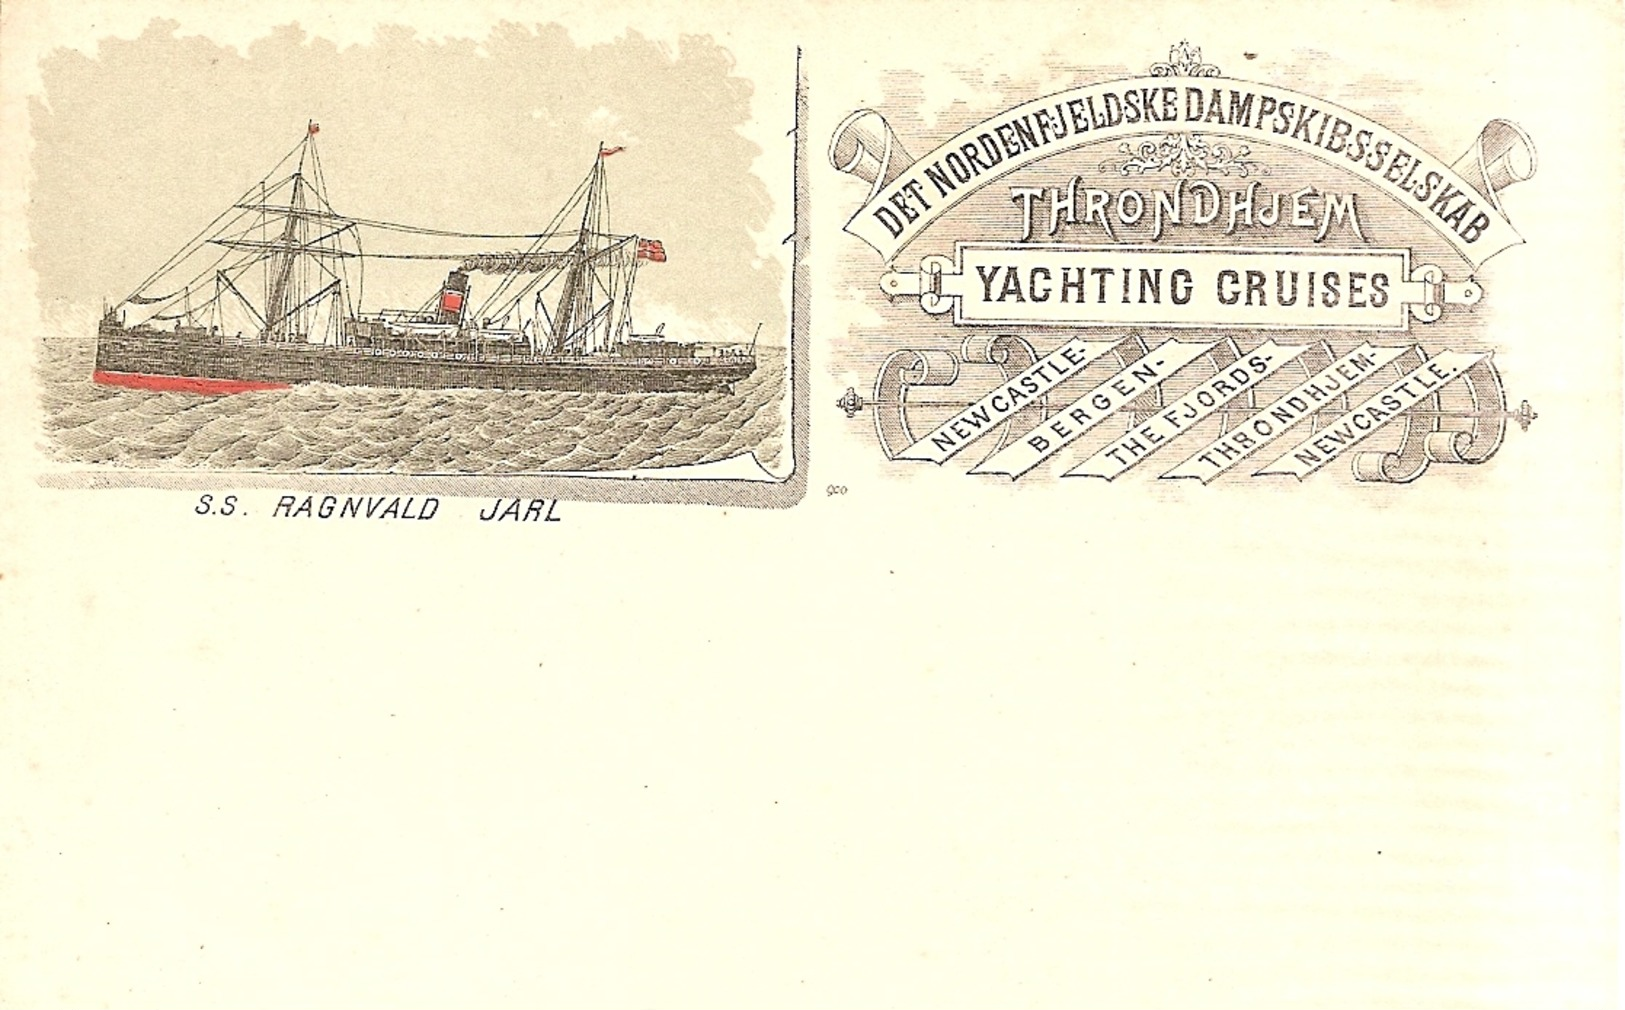 NORVEGE  -  SS. RAGNVALD JARL - Norway